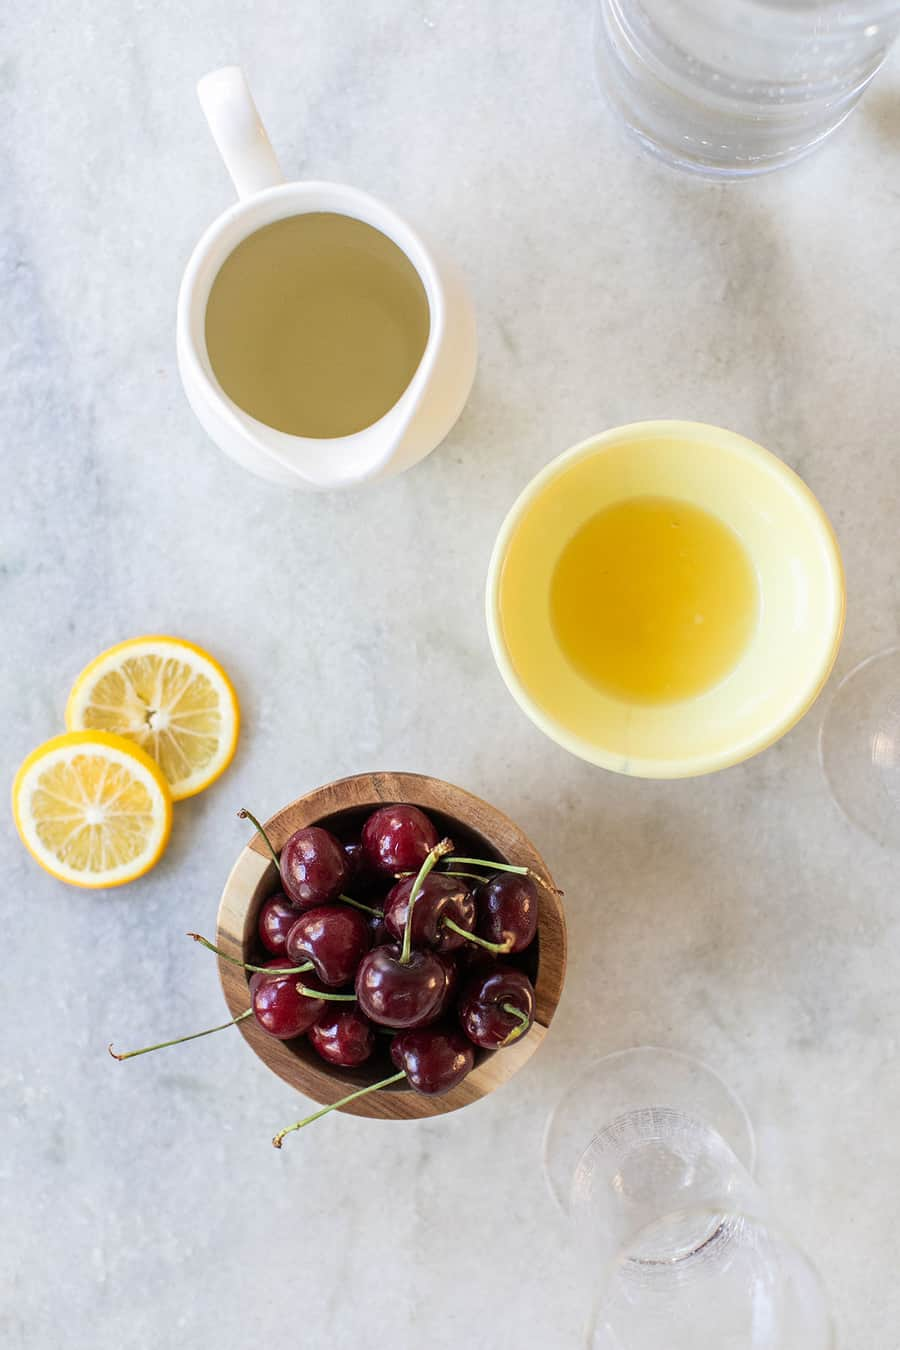 cherries, lemon juice, simple syrup and gin